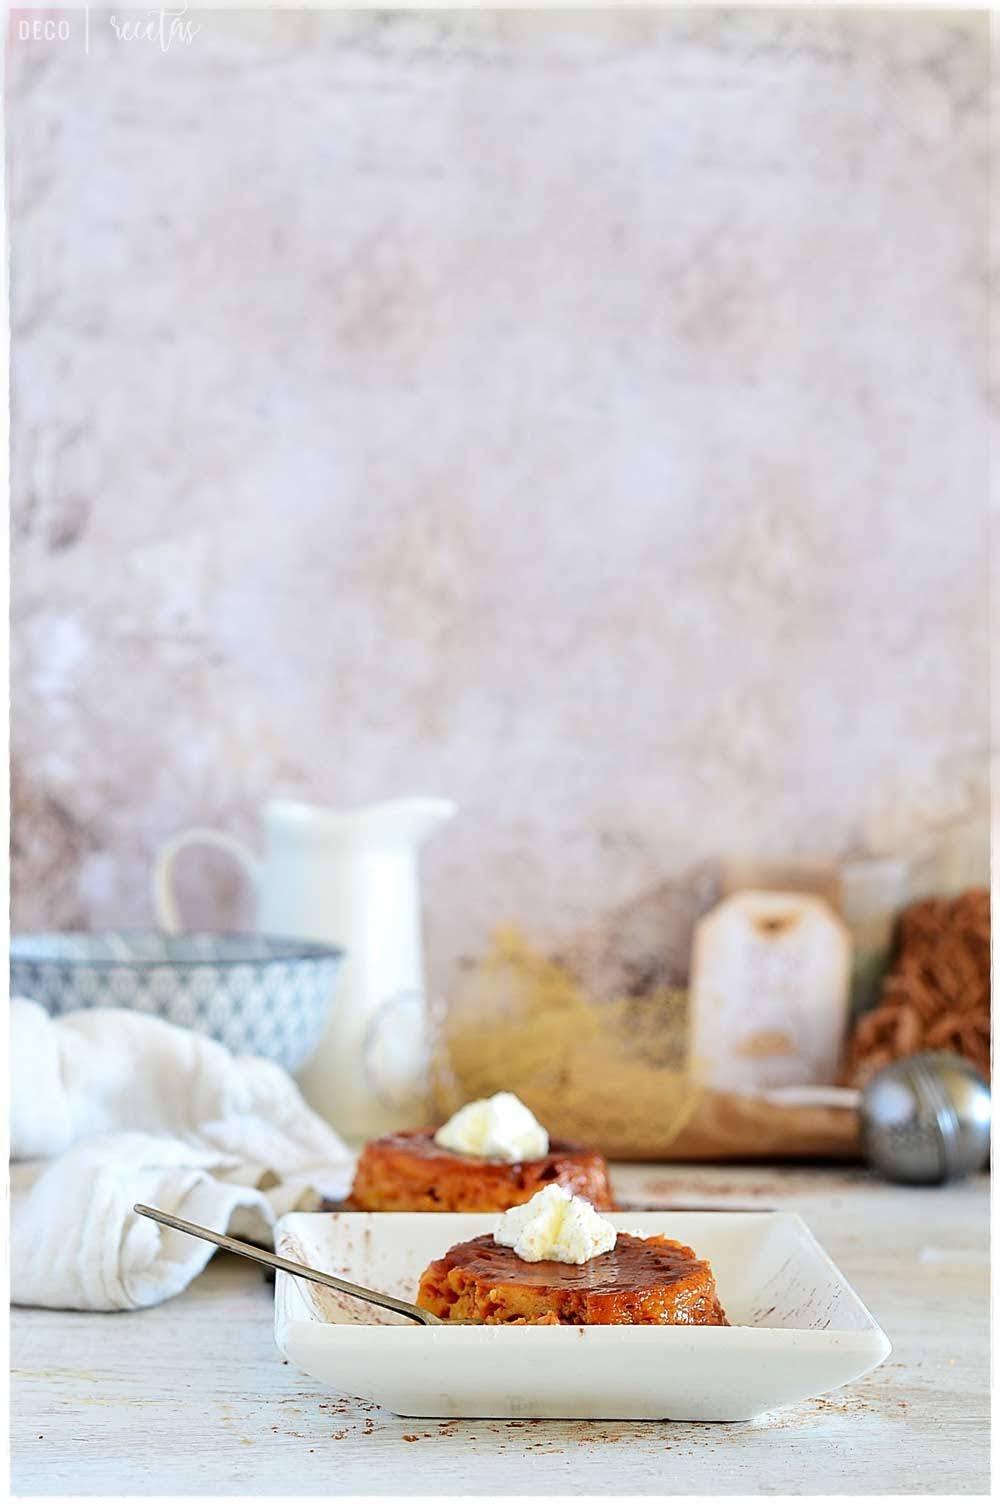 Receta de flan de huevo al horno